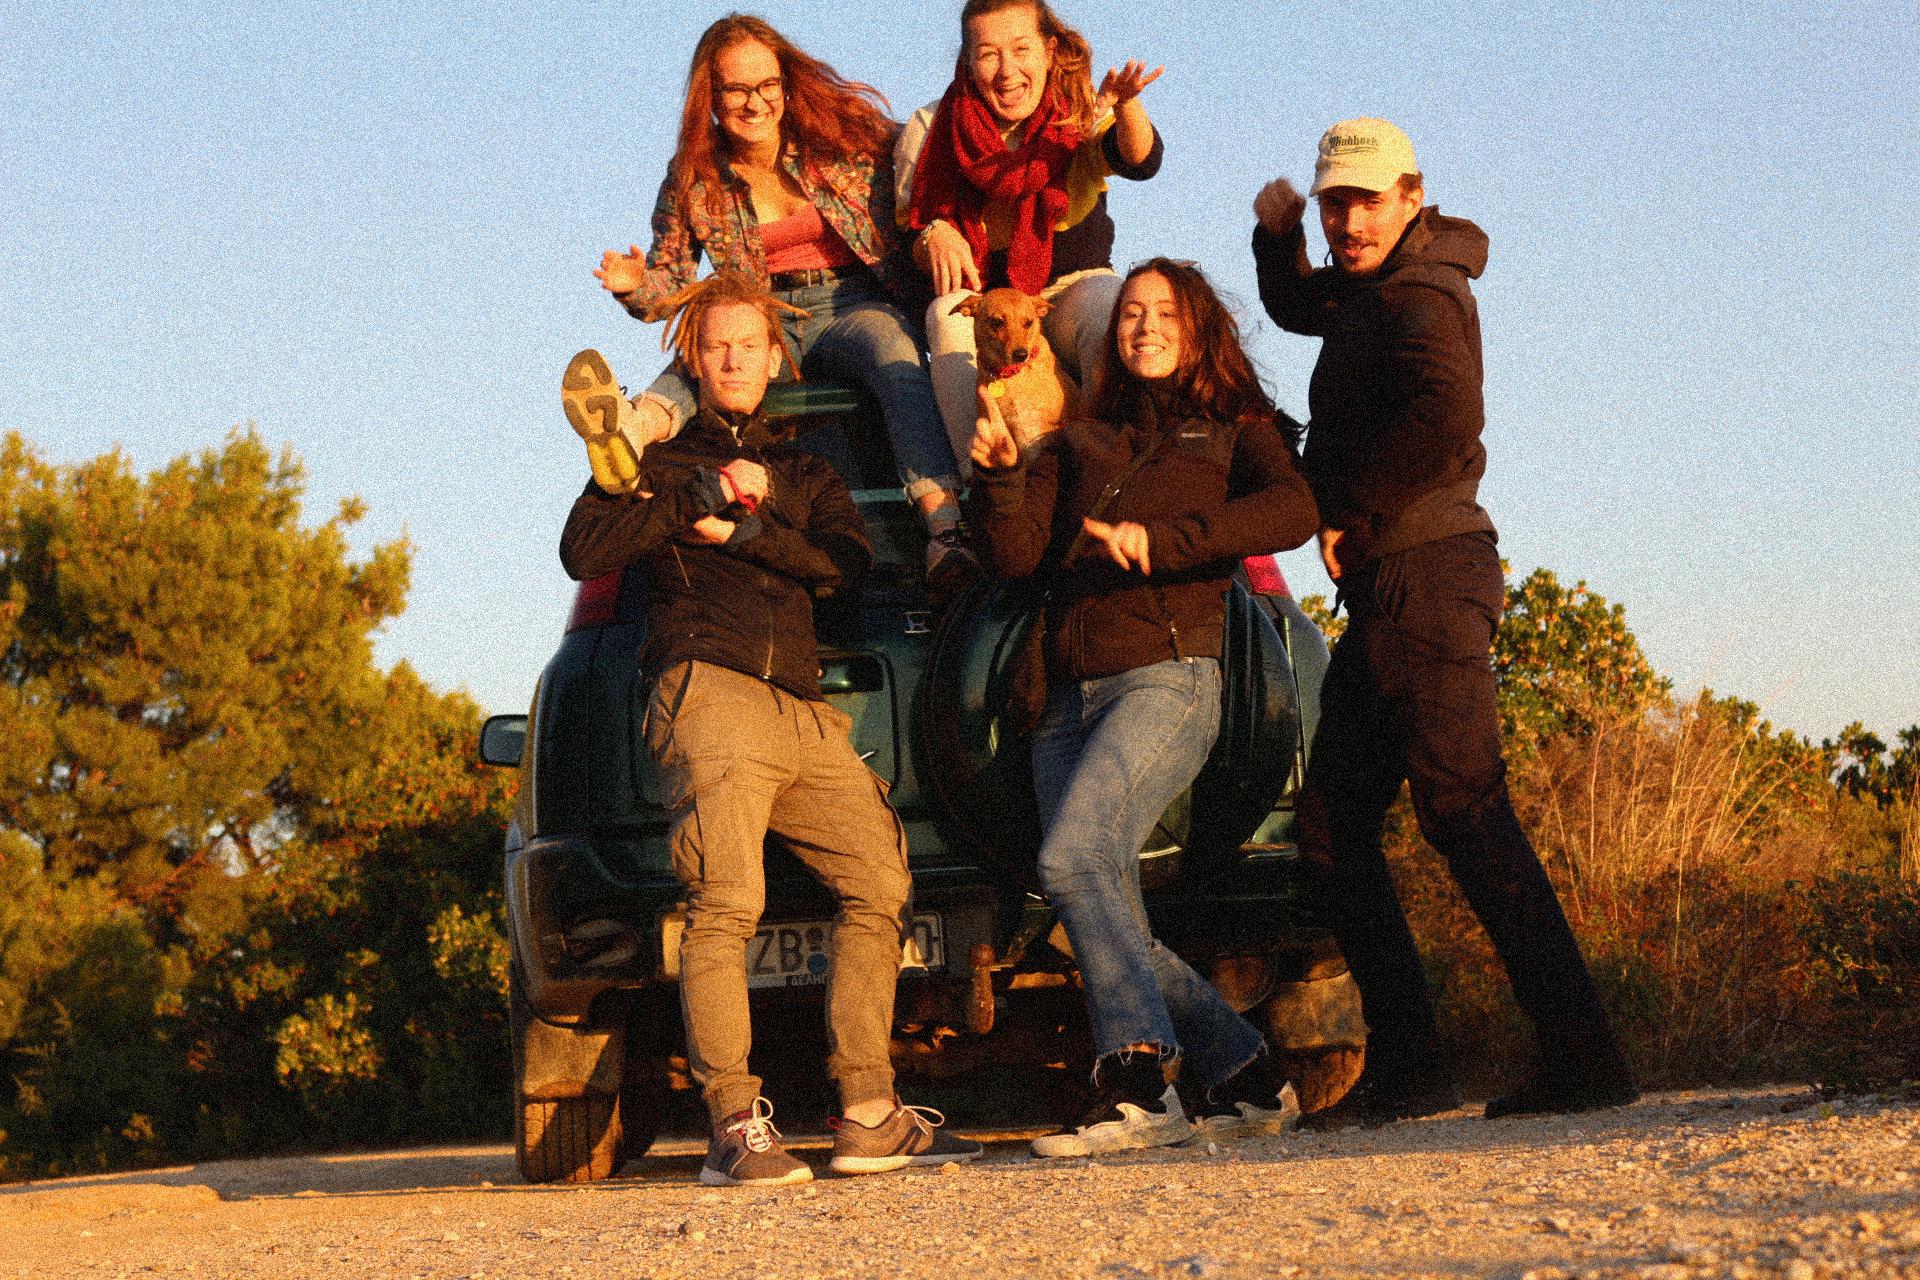 Volunteering in Greece - Joyce 'n' Fun